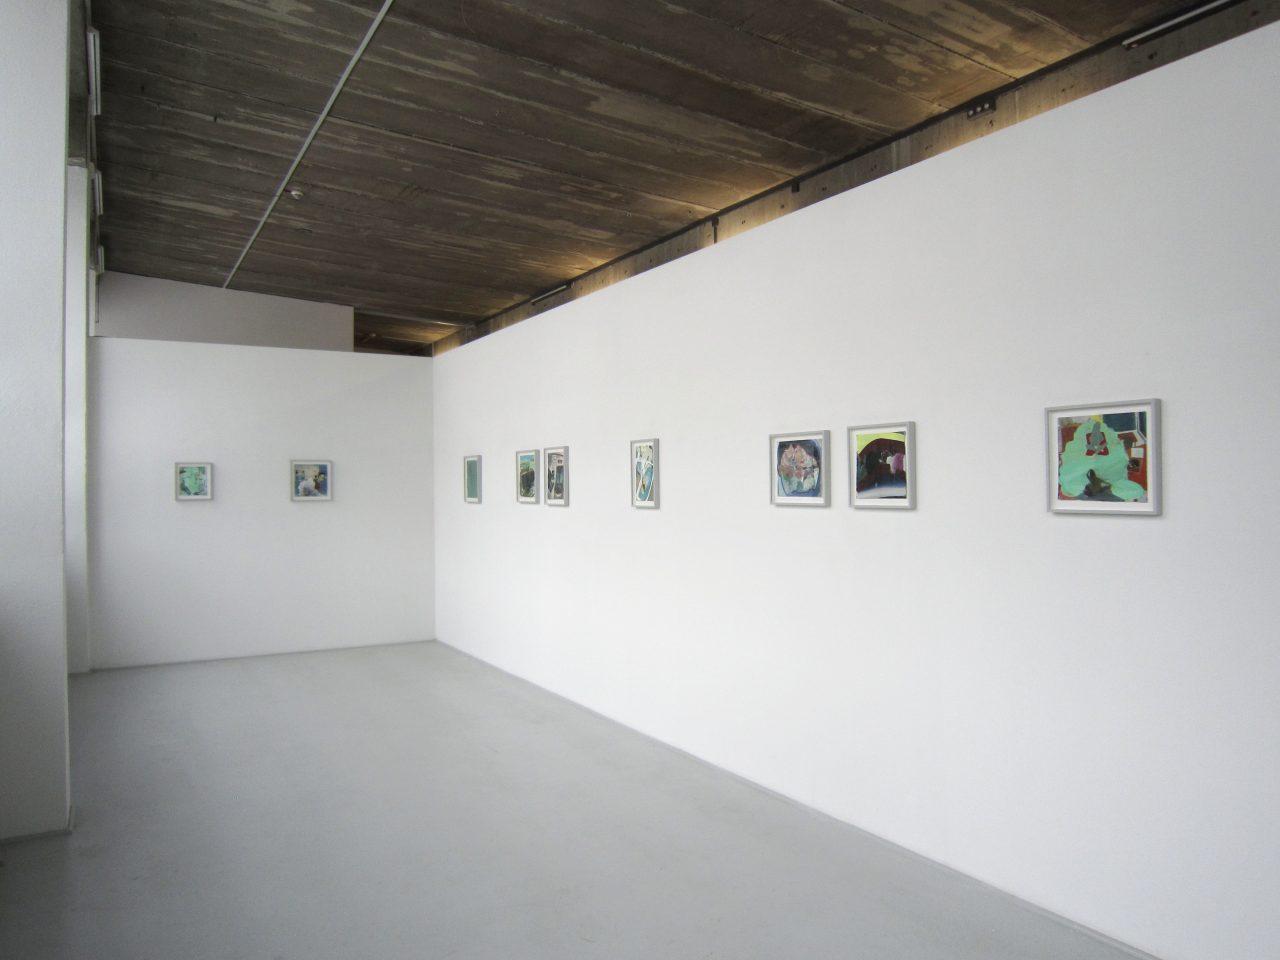 Installation view ULTRA MEER, Galerie Borssenanger, Chemnitz, 27.01.-24.02.2017